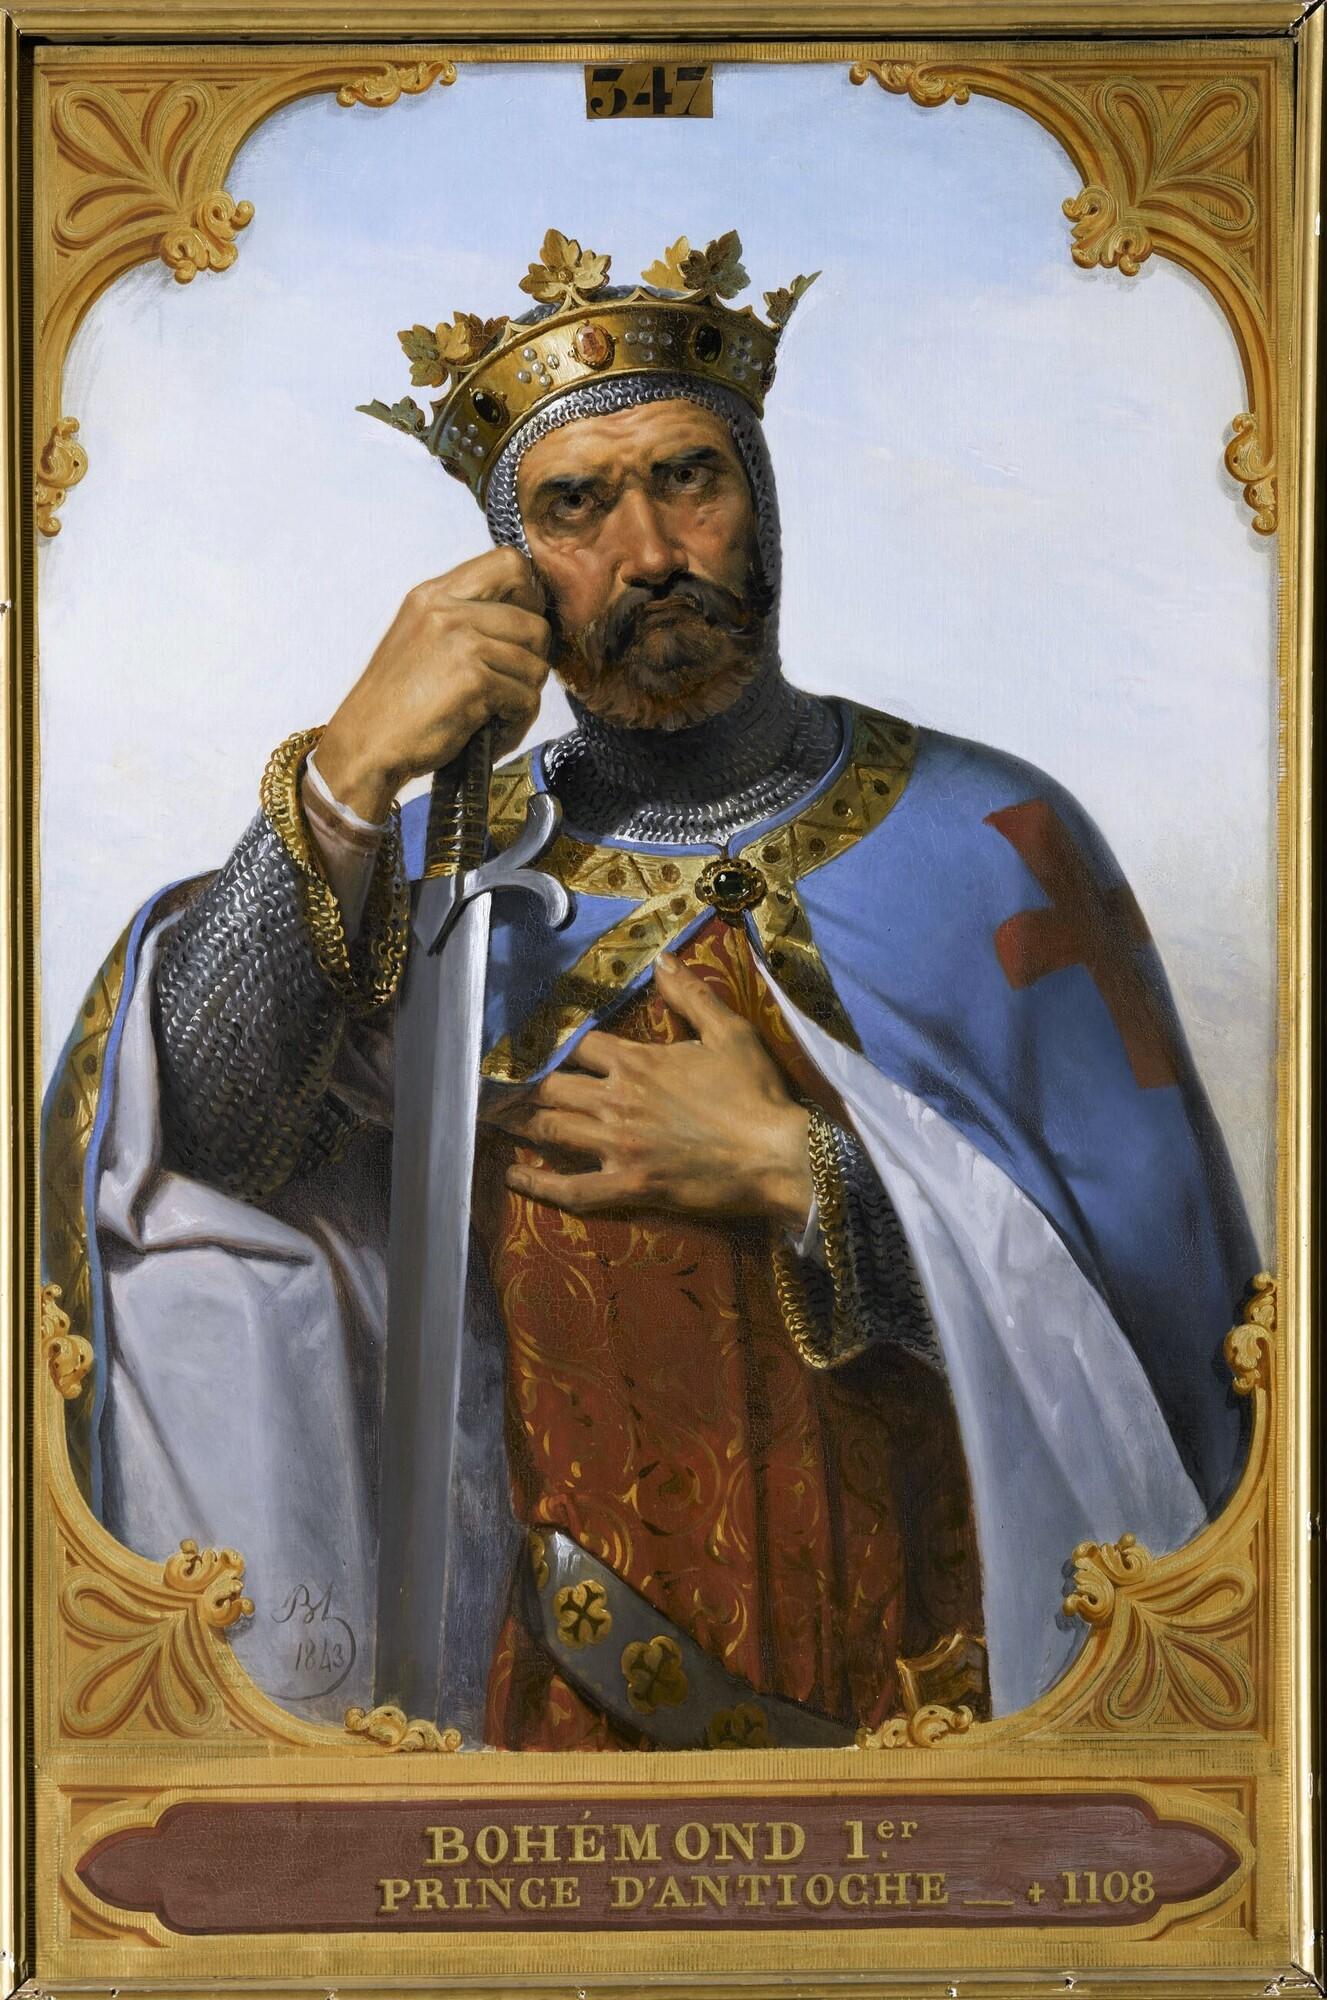 Bohémond Ier, prince d'Antioche. Peintre : Merry-Joseph Blondel.